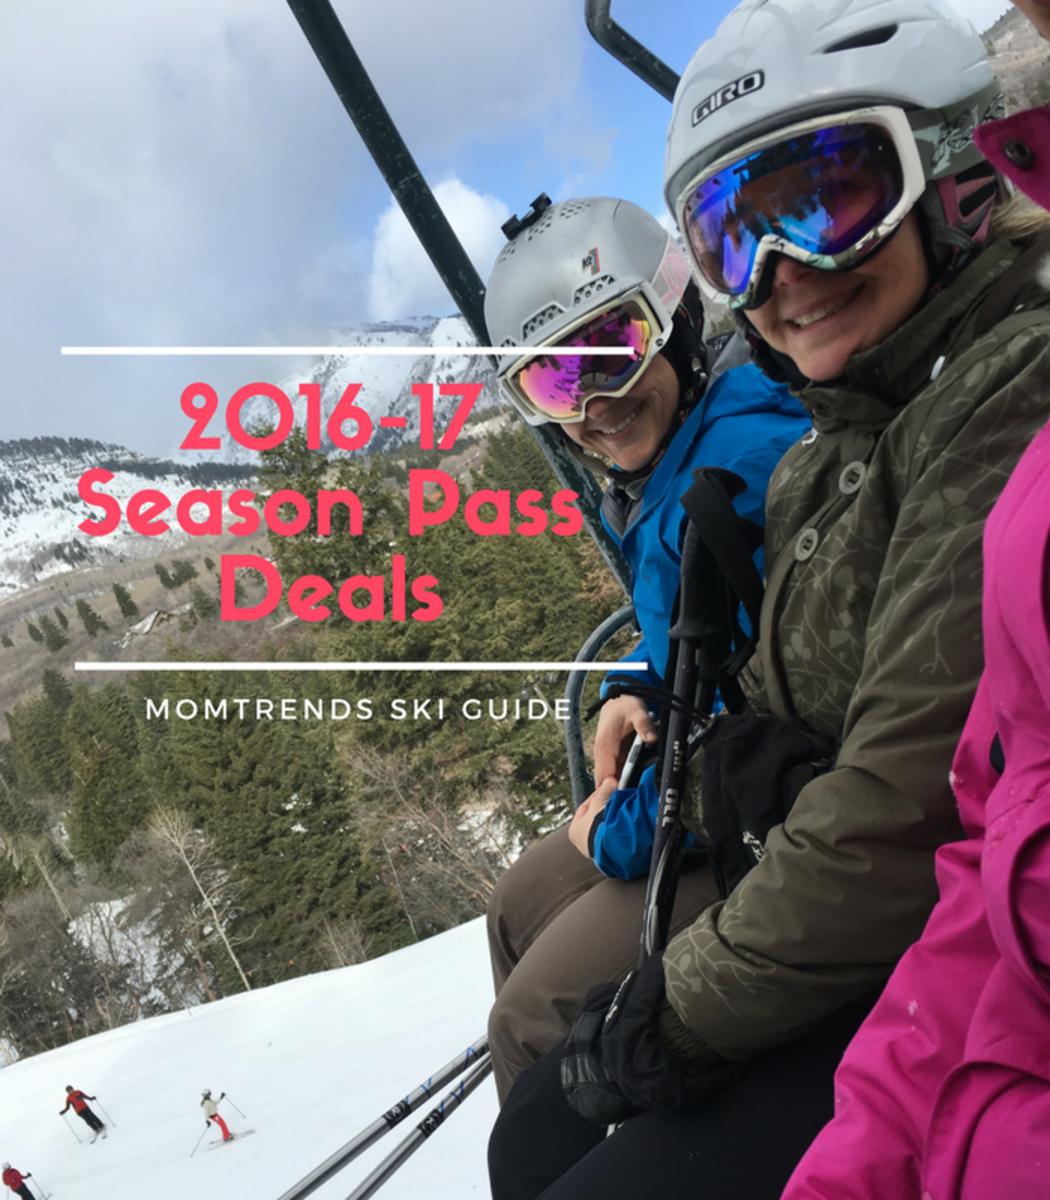 Comparing Ski Season Pass Deals